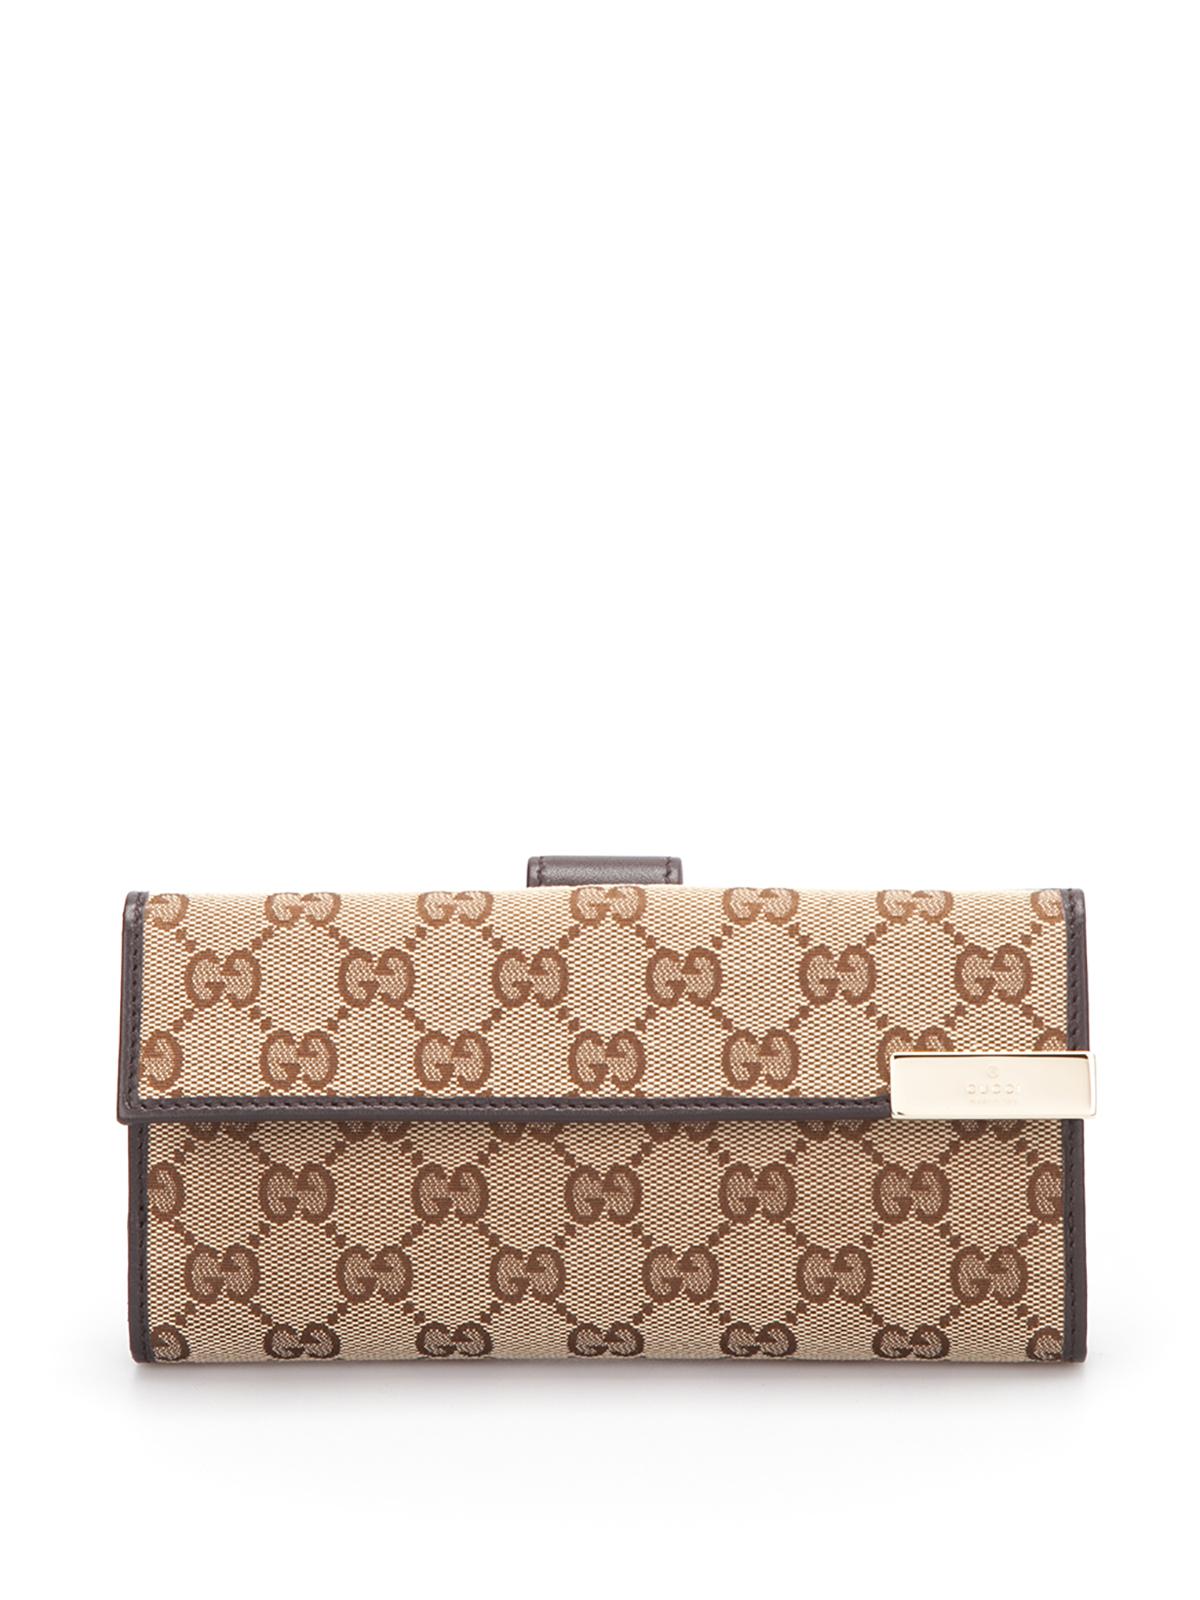 ed473e19462 Gucci Gg Canvas Continental Wallet Wallets Purses 257012